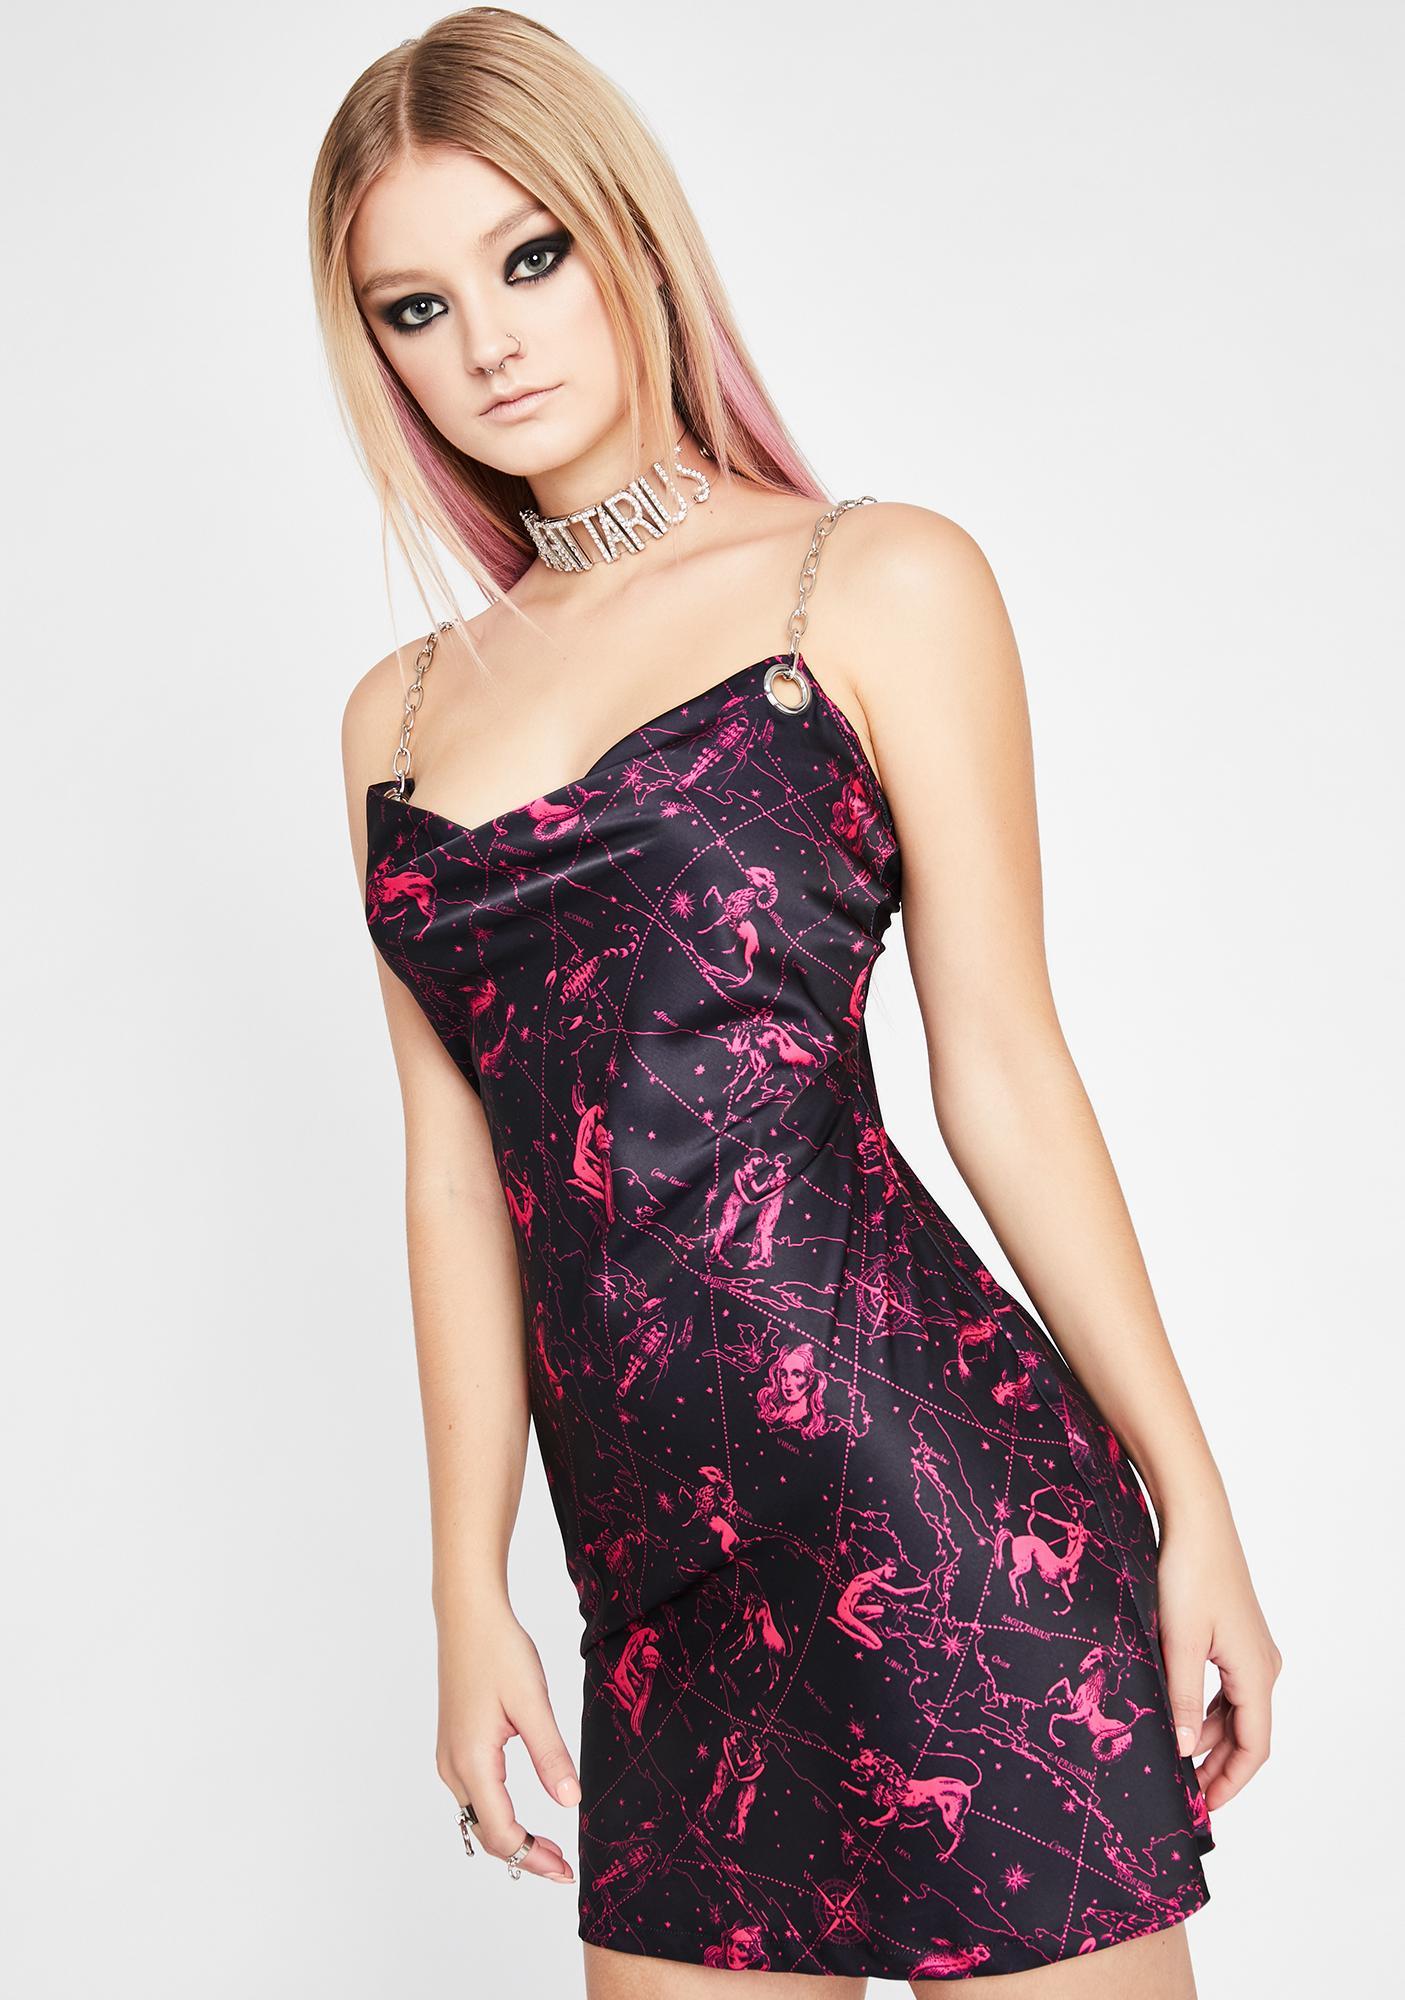 HOROSCOPEZ Defiant Dreamweaver Slip Dress